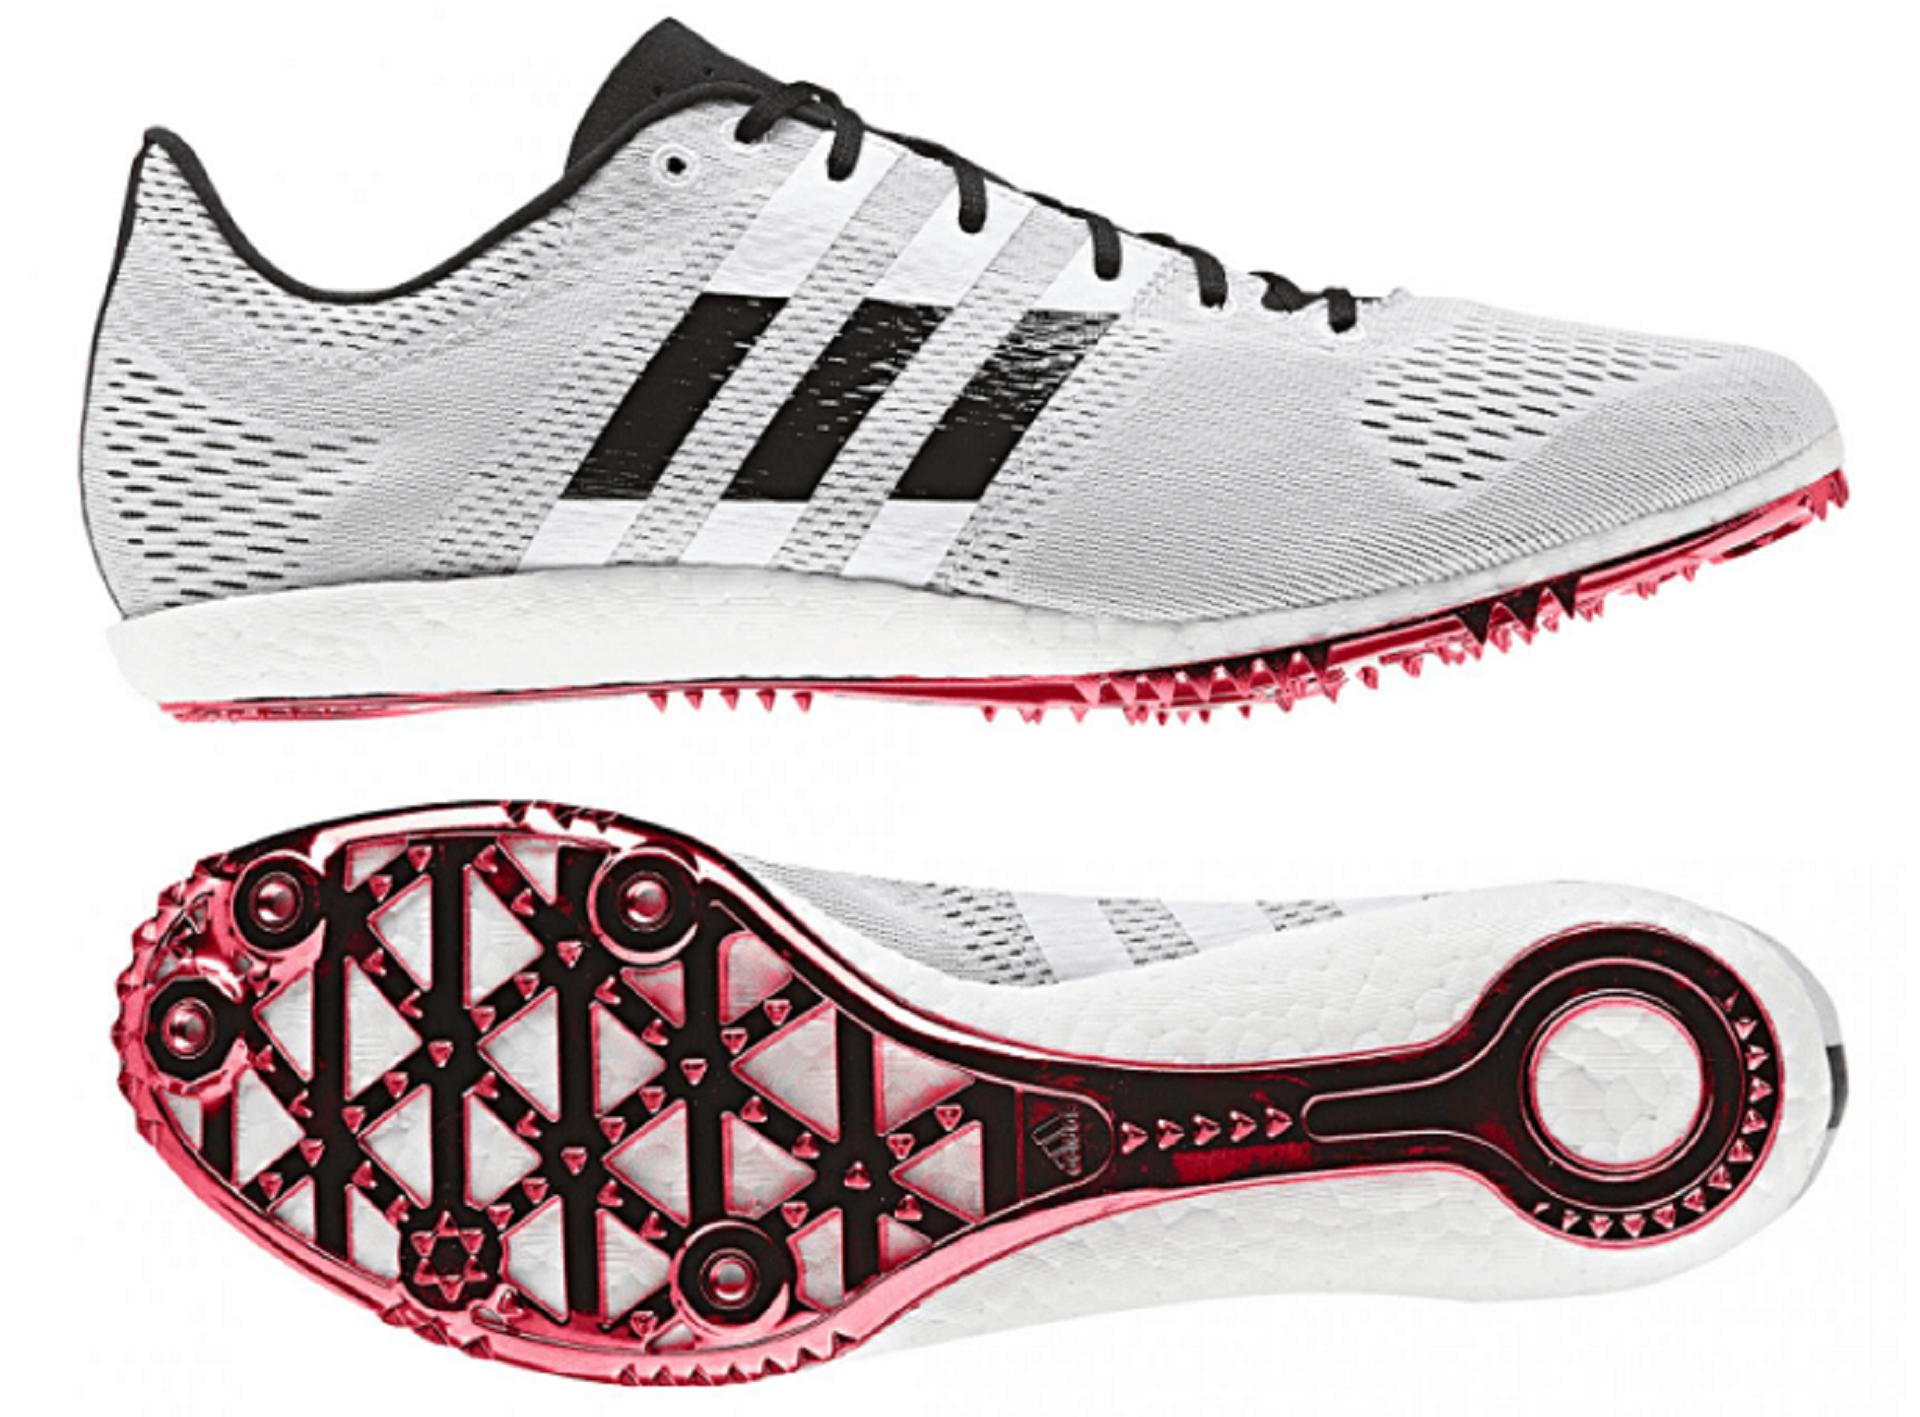 adidas adizero track spikes